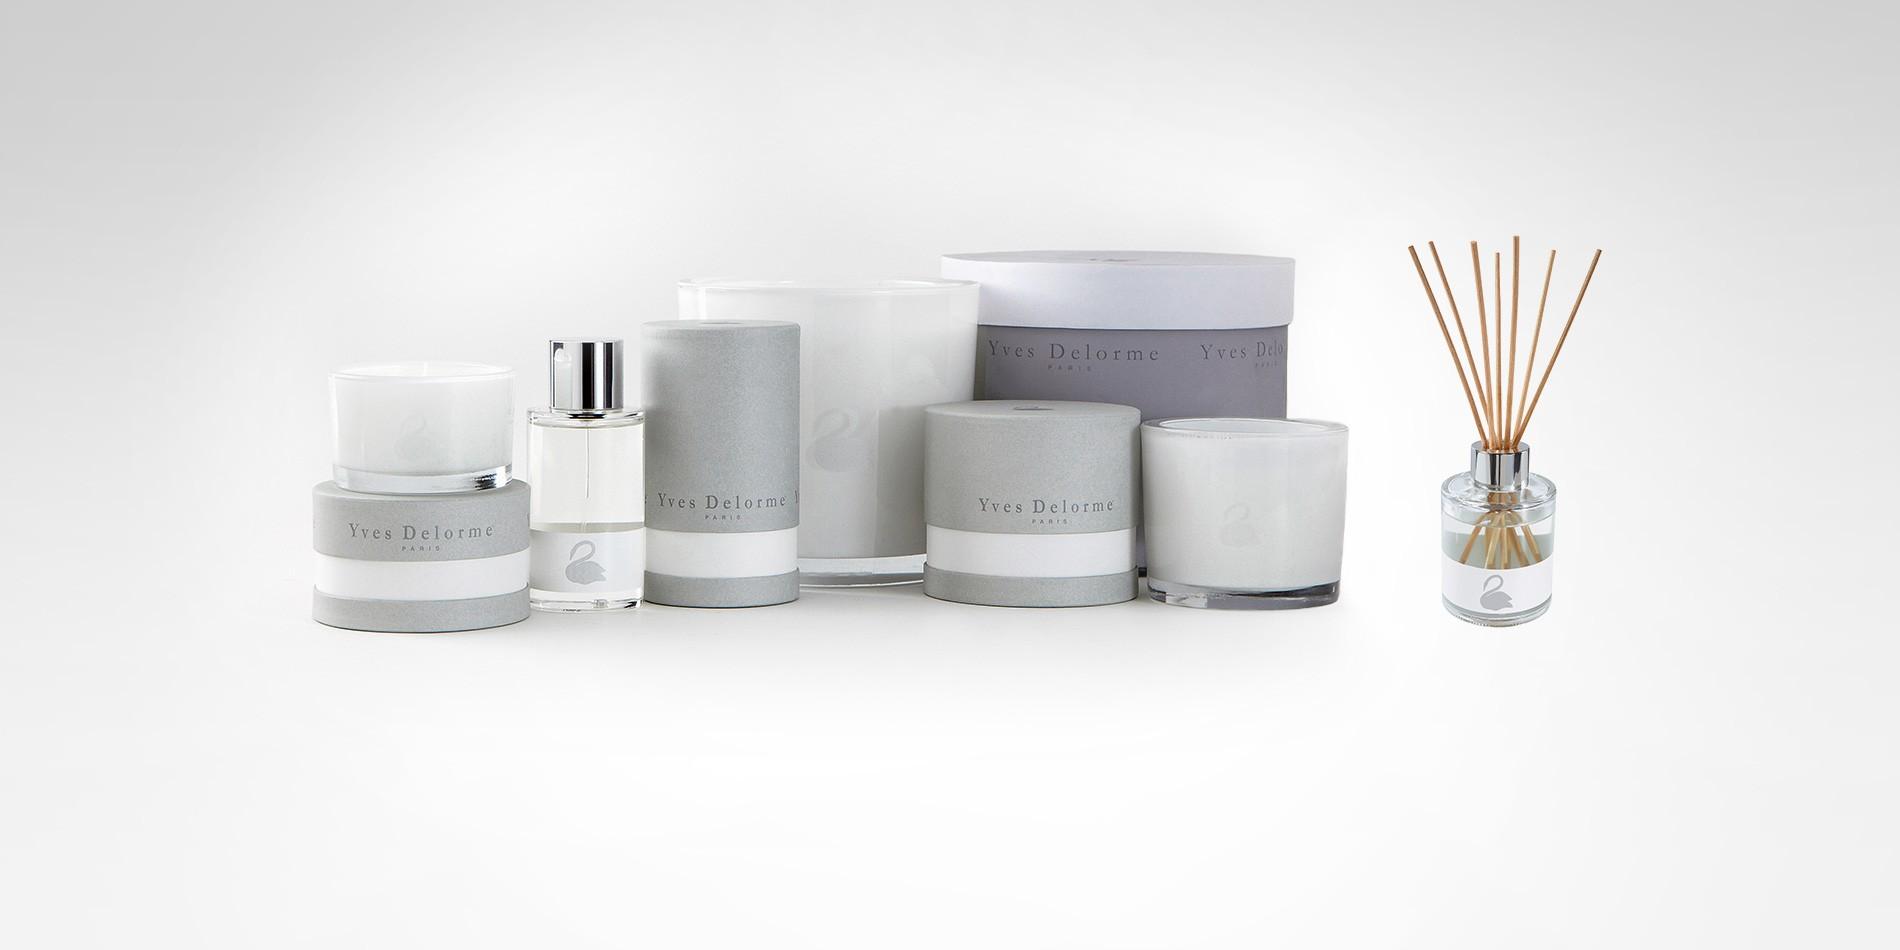 Свечи, спрей и диффузер Santal, Yves Delorme, салоны Yves Delorme